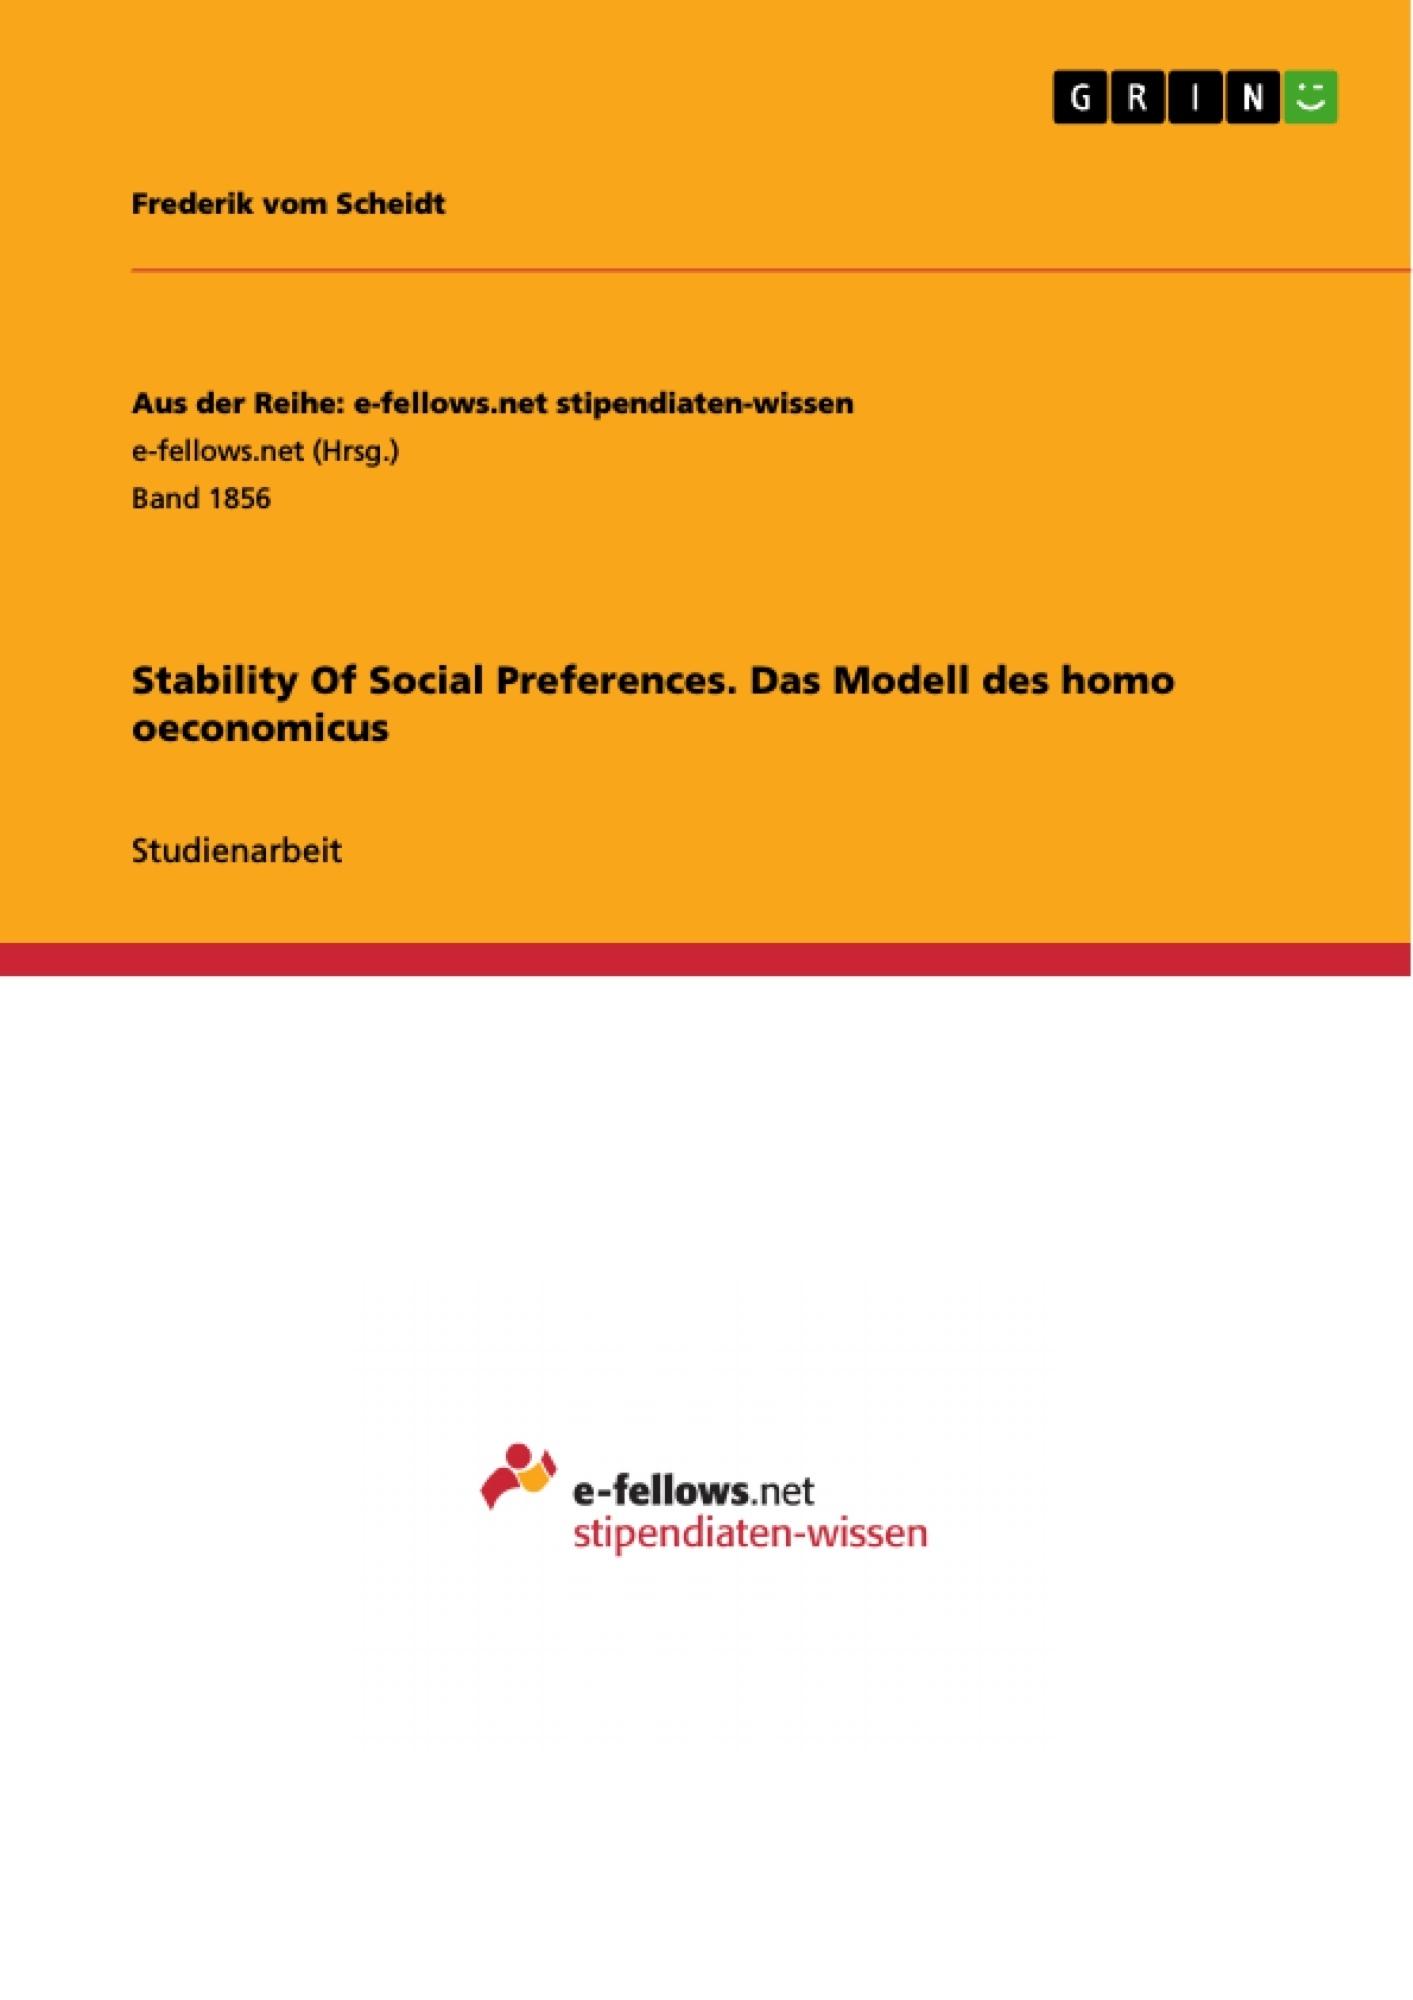 Titel: Stability Of Social Preferences. Das Modell des homo oeconomicus